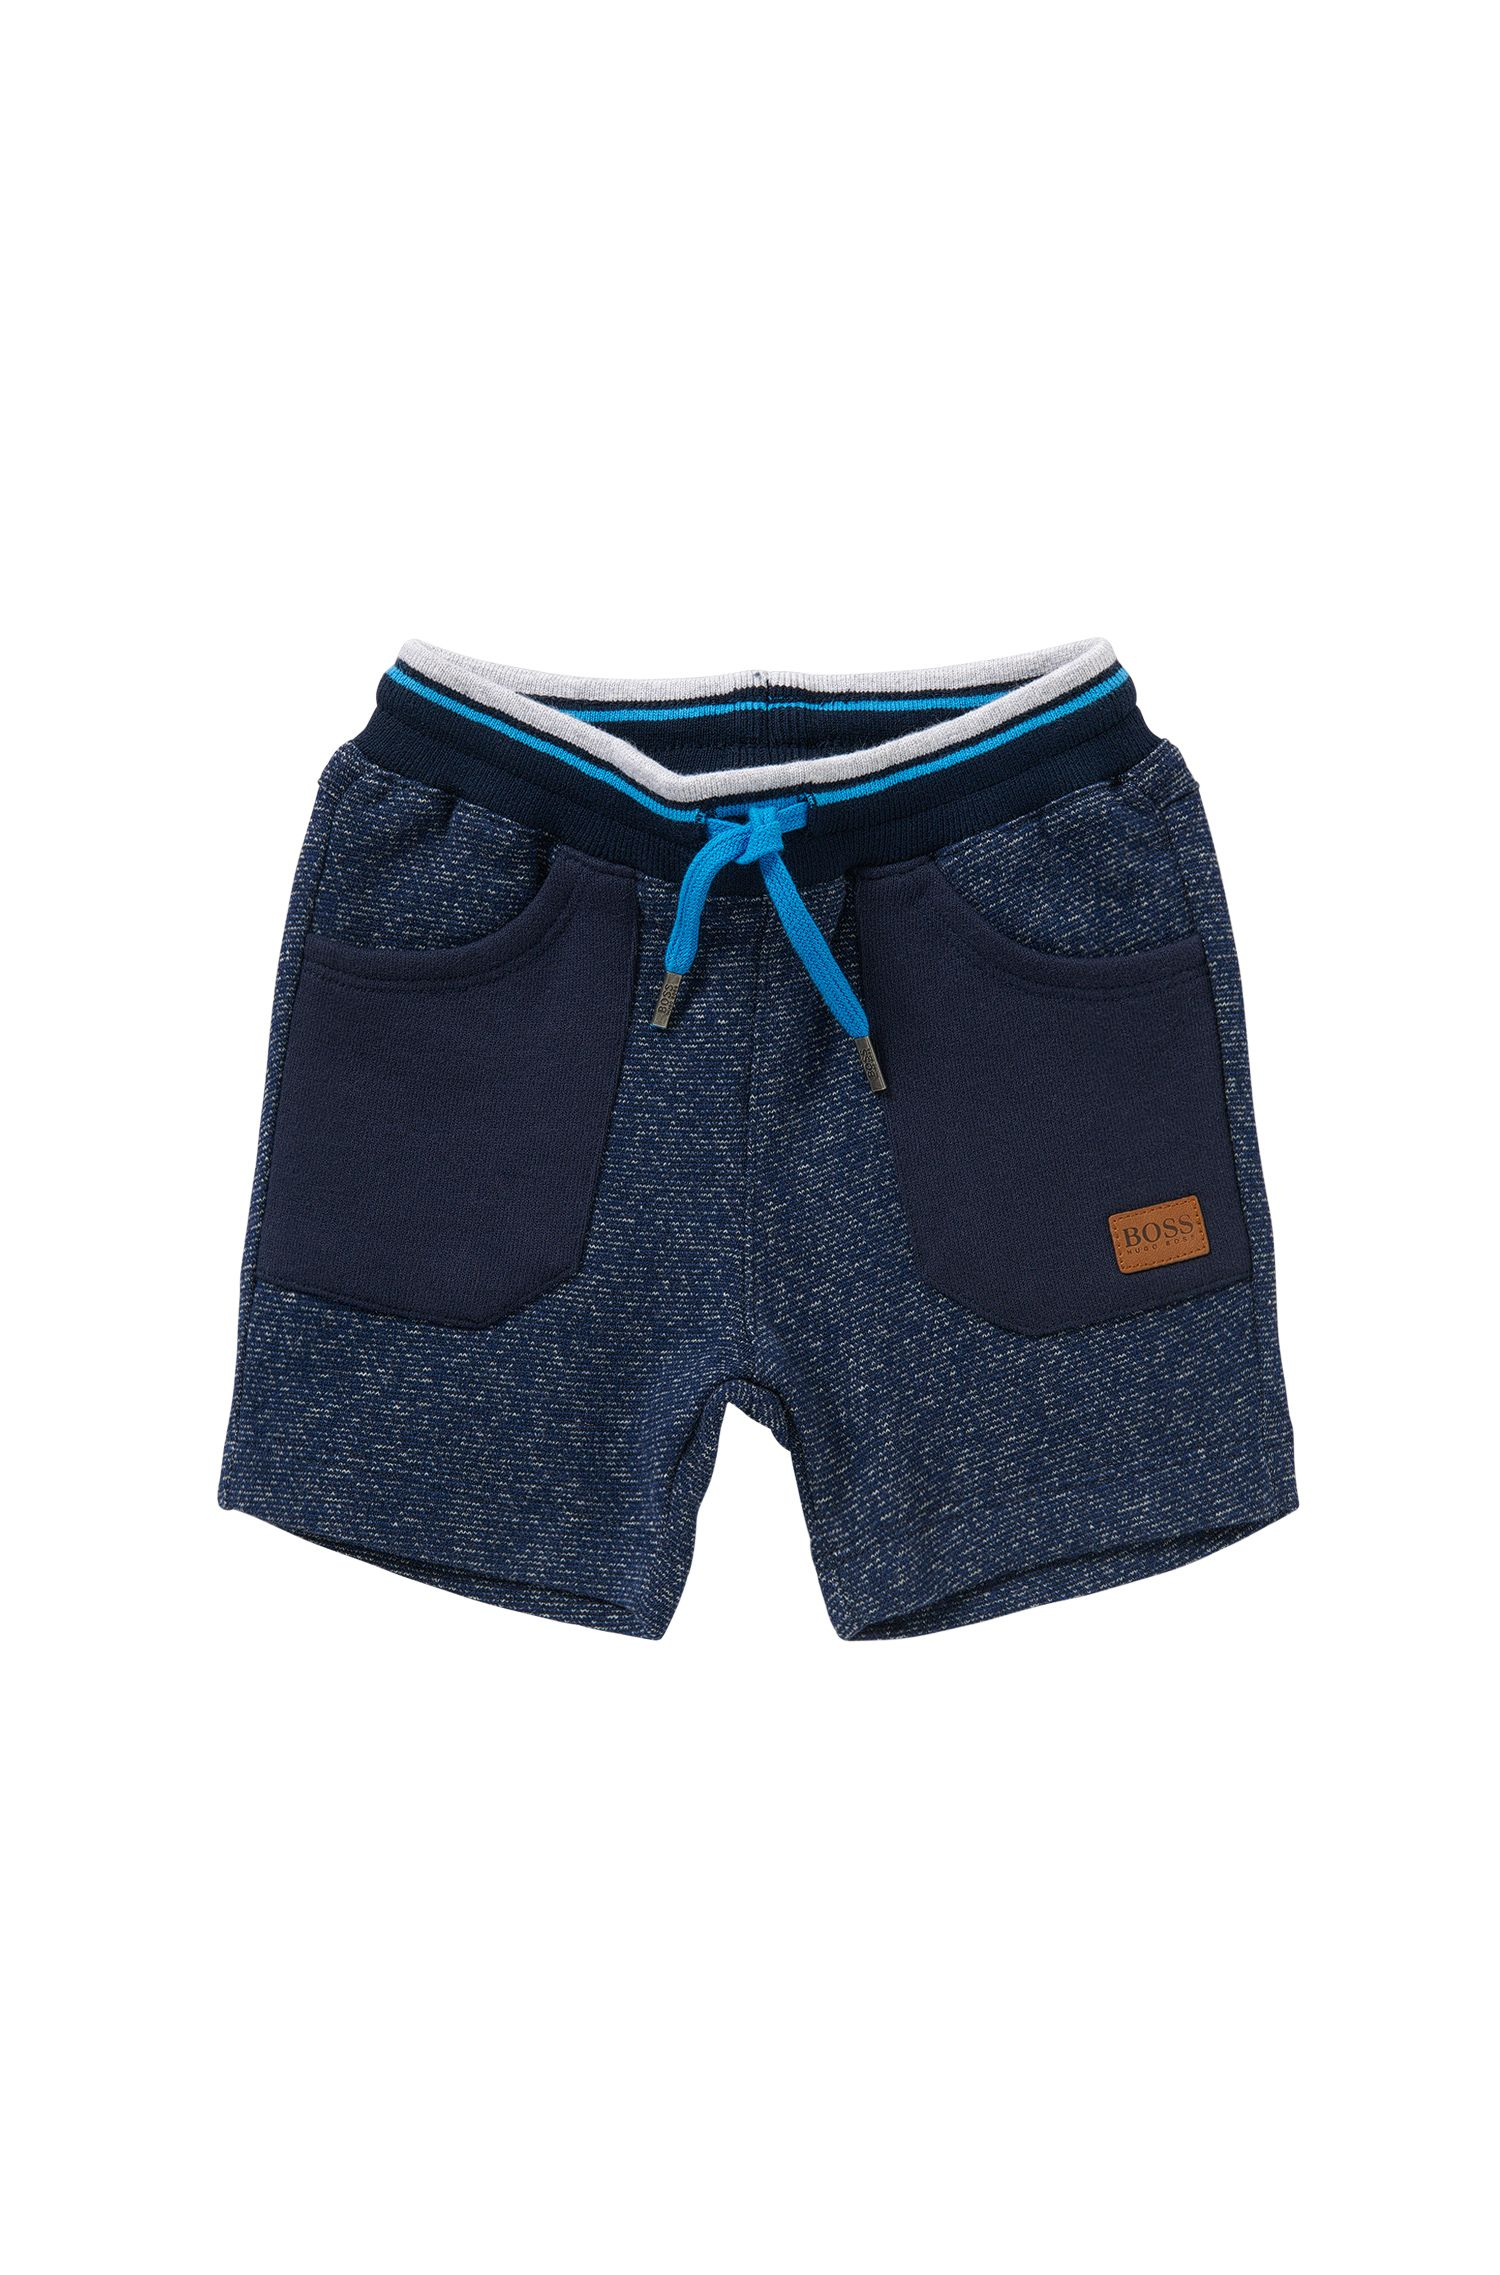 'J04217' | Toddler Cotton Melange Shorts